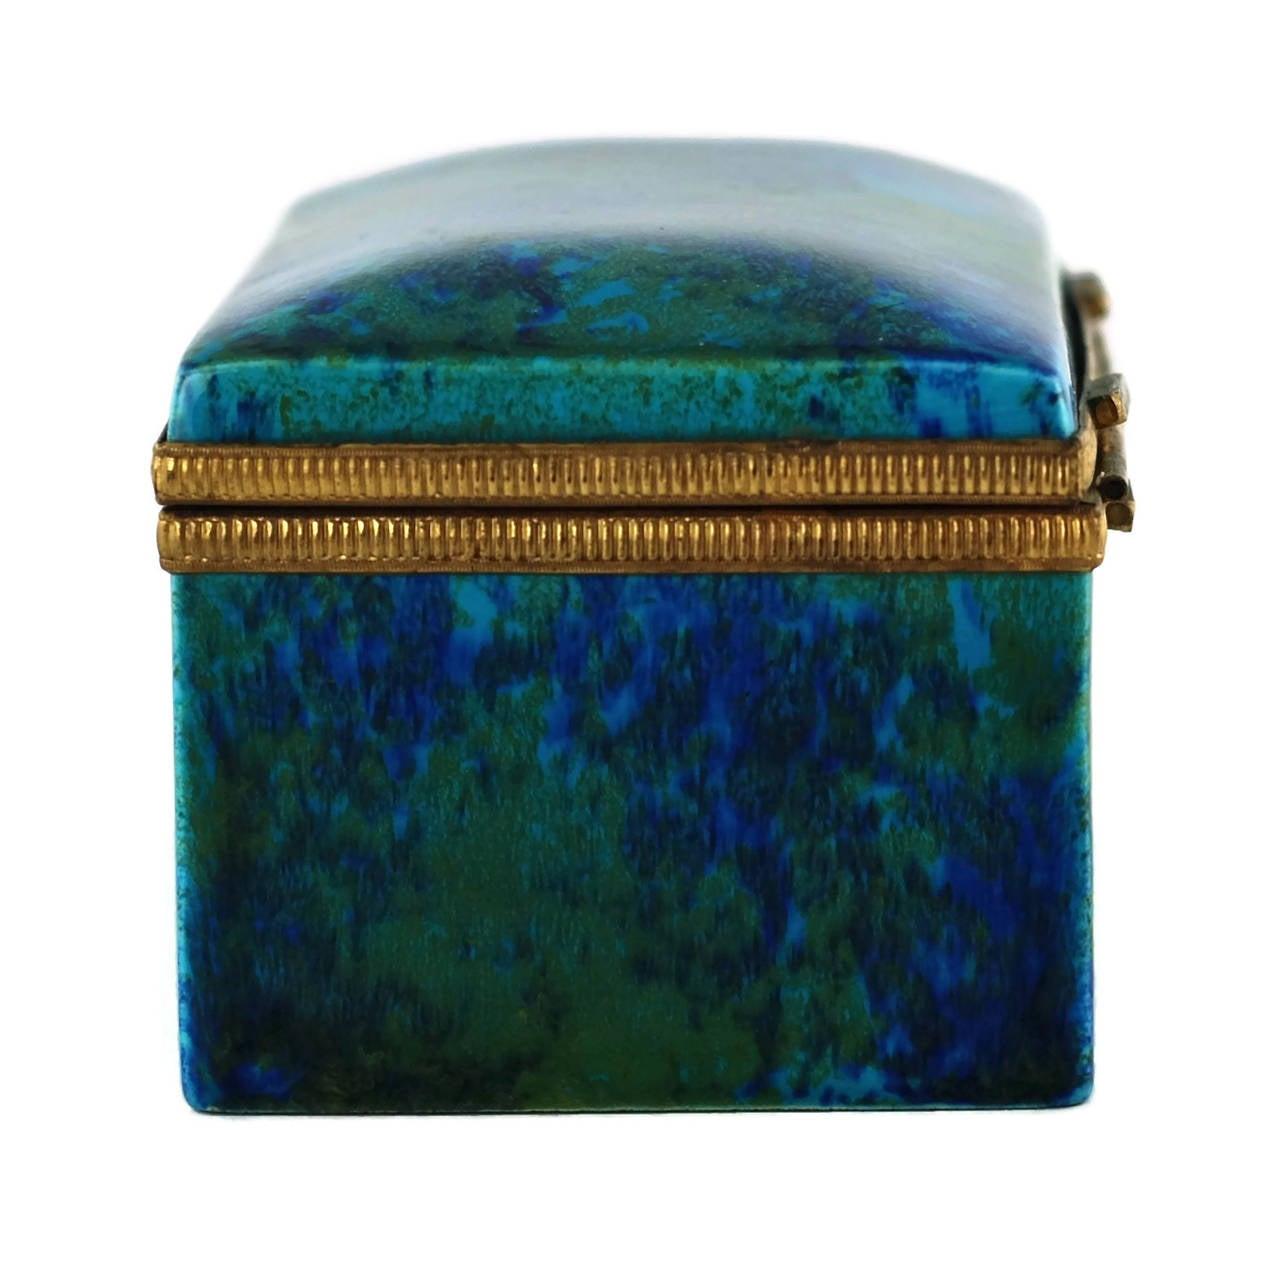 Paul Milet Sèvres Porcelain Hinged Dresser Box with Ormolu Mounts For Sale 1